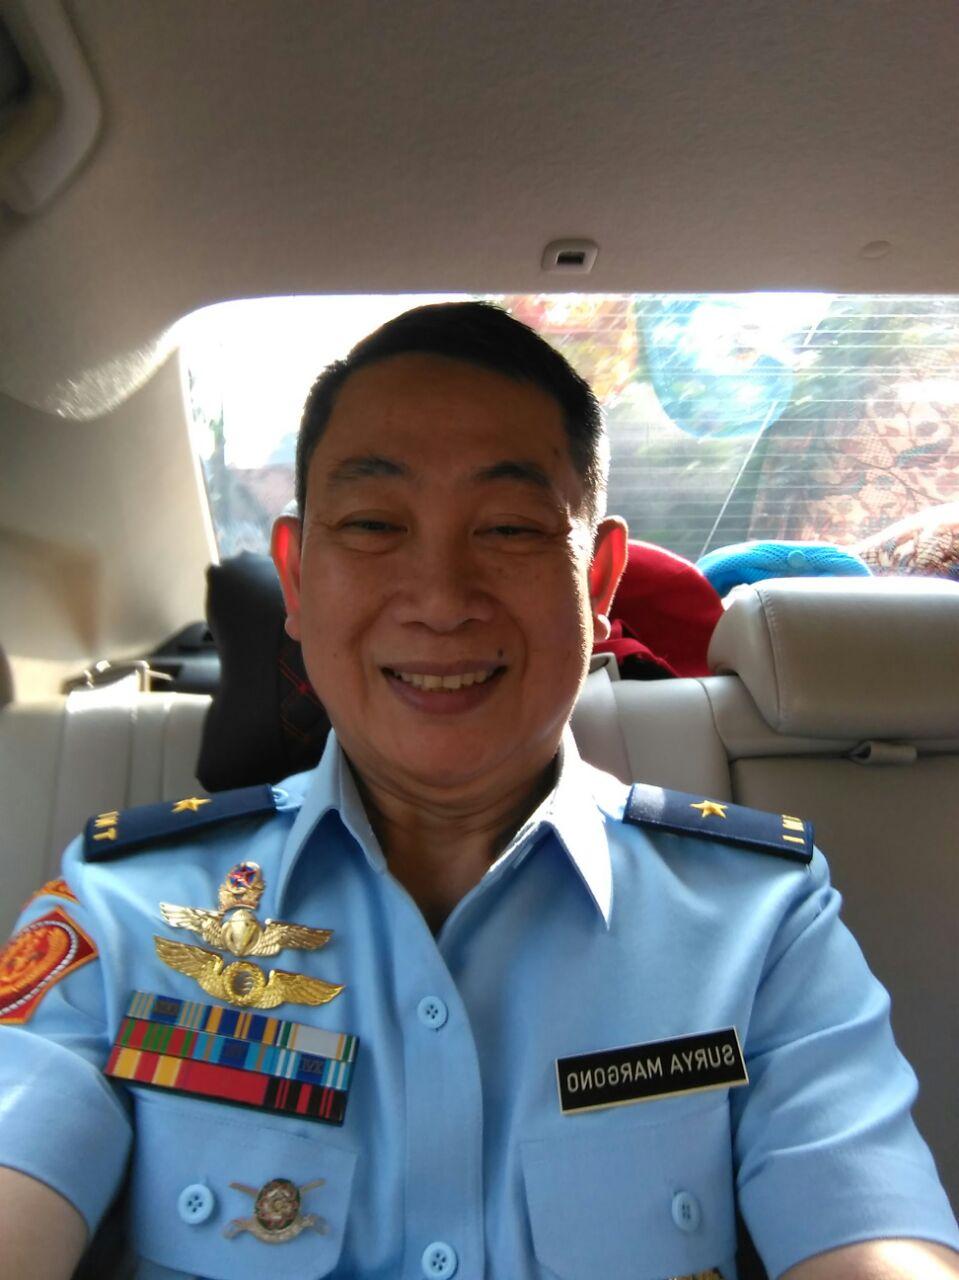 Warga Tionghoa Dari Kalbar Ini Berhasil Mendapatkan Jabatan Sebagai Marsekal ( Jenderal) TNI AU